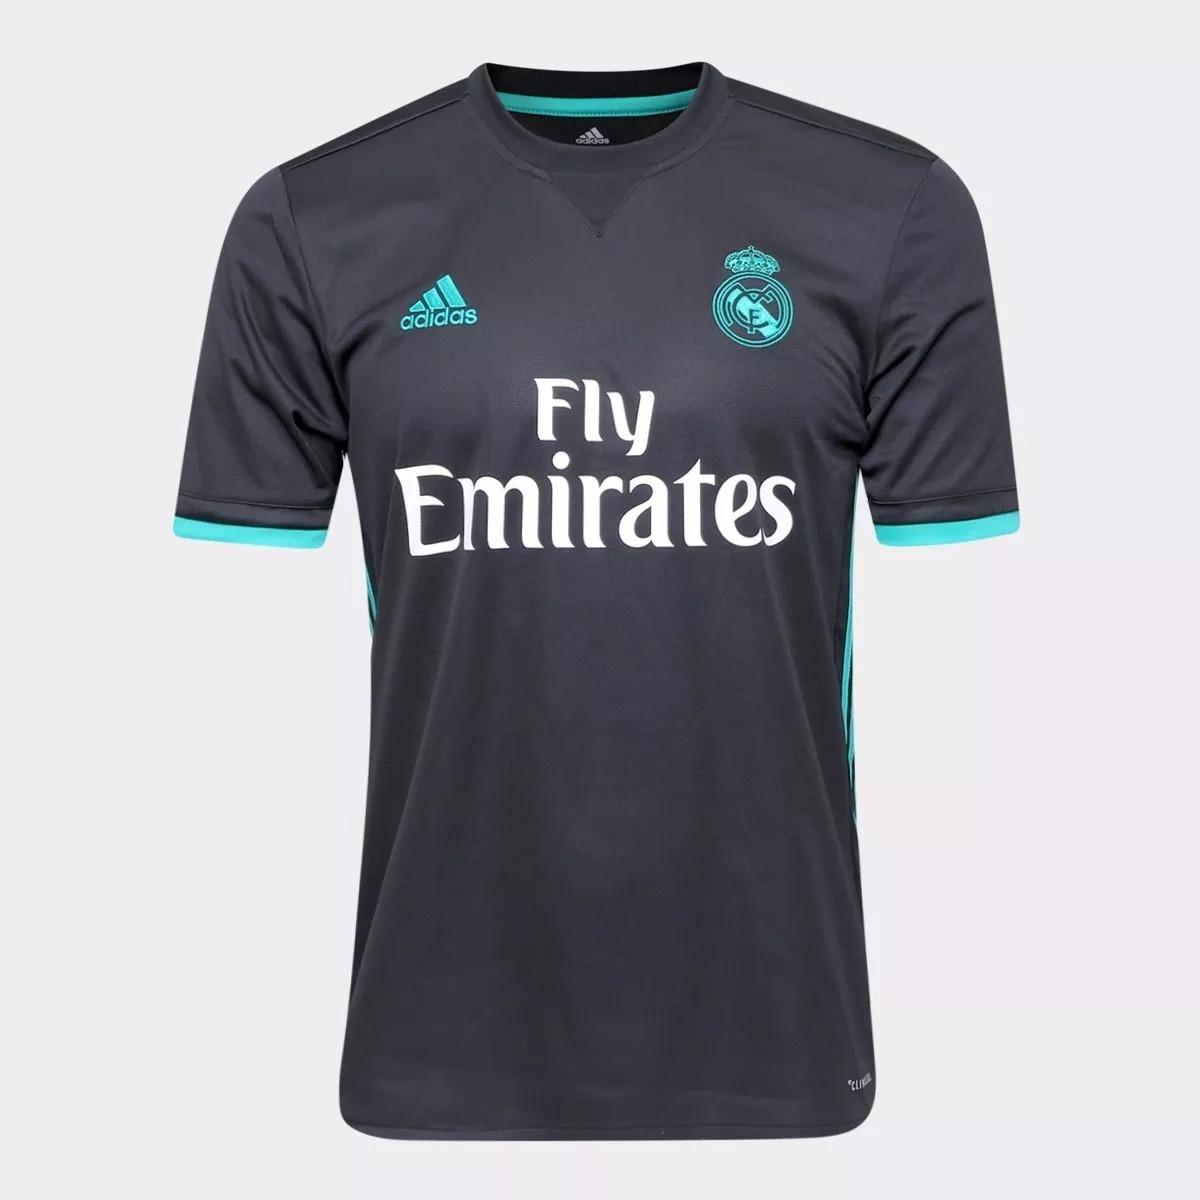 2eed8b5b36e2a camisa real madrid champions torcedor oficial 2018. Carregando zoom.